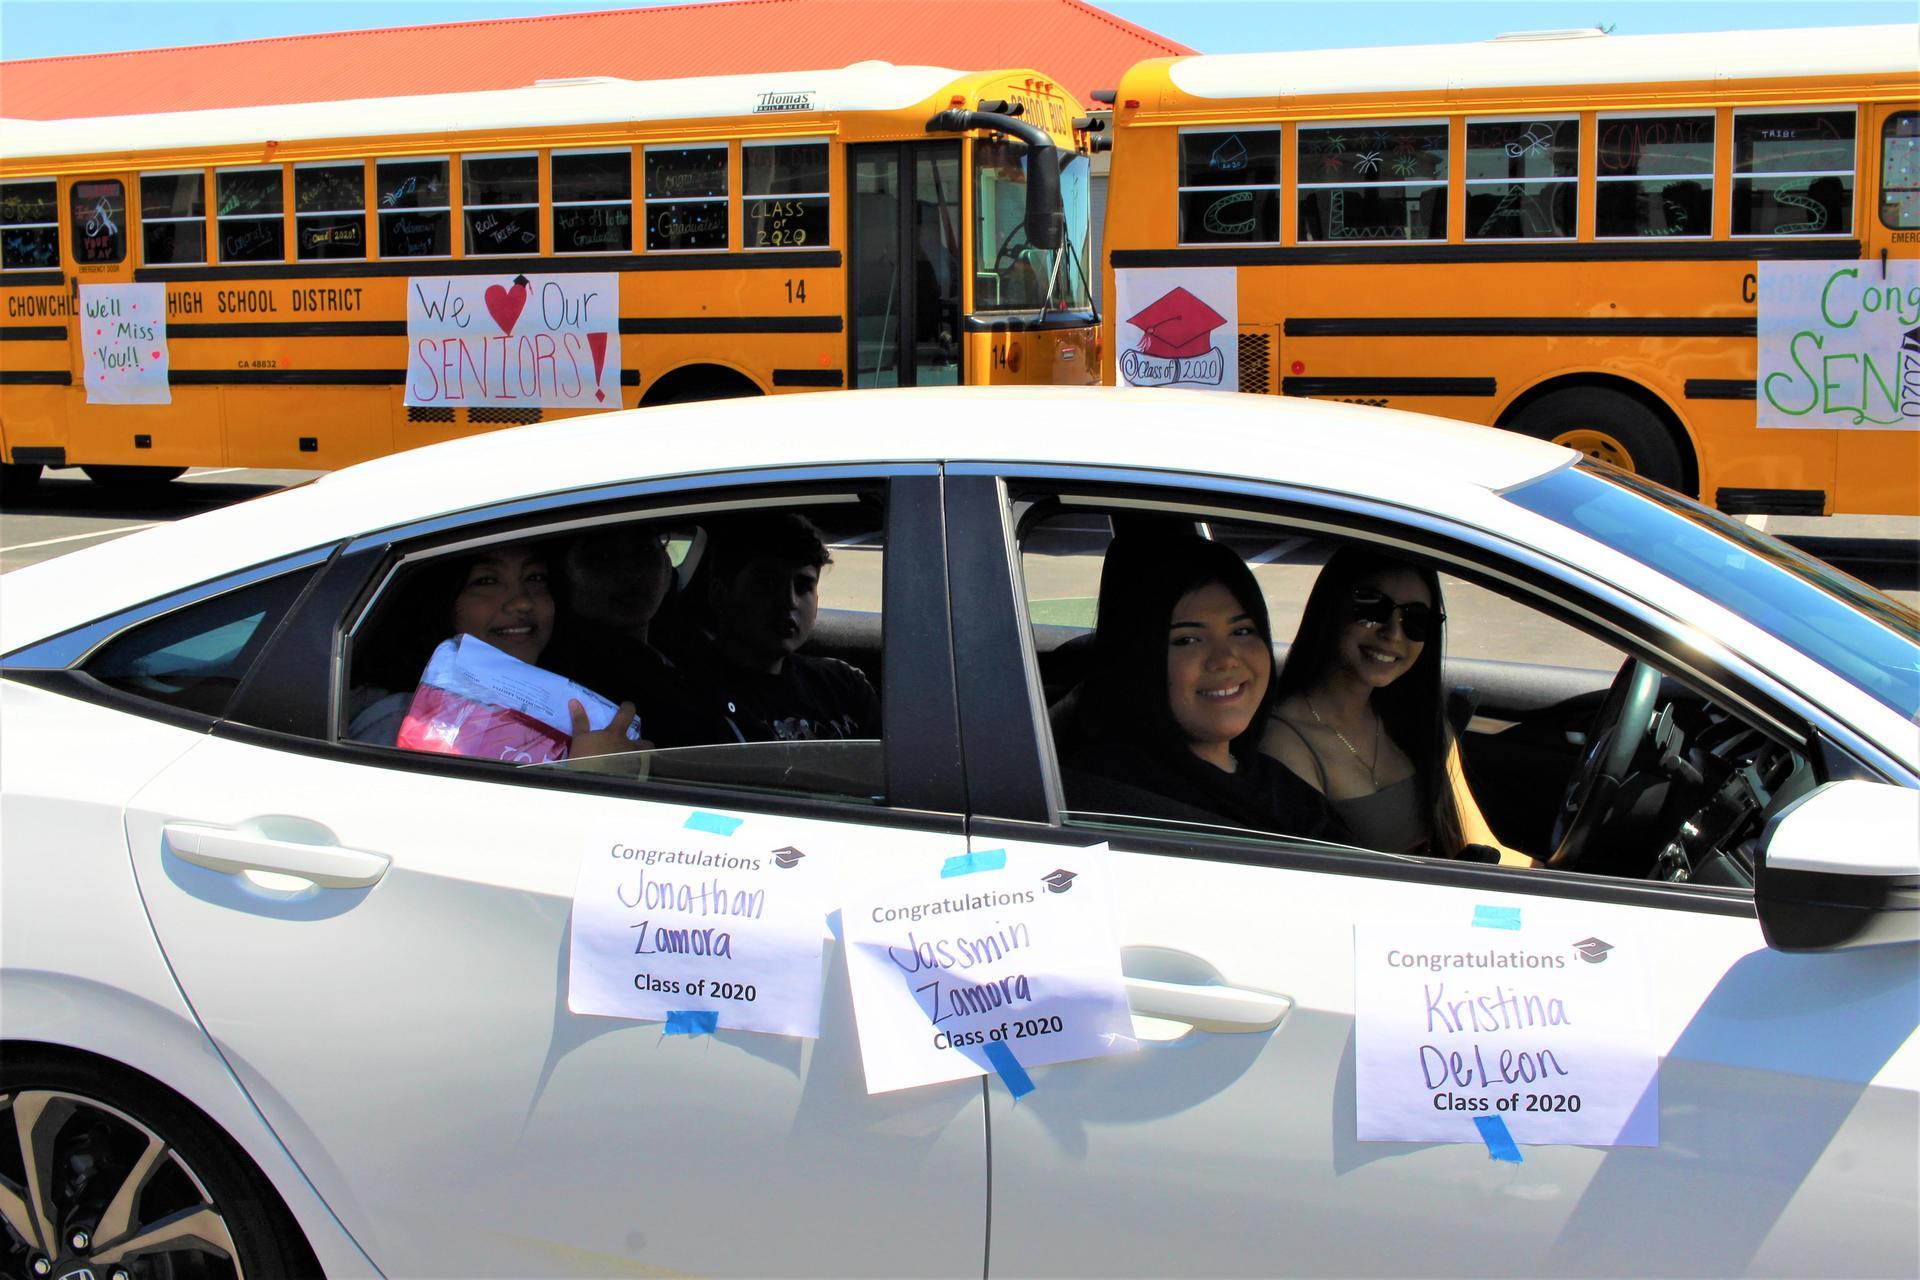 Kristina DeLeon, Jassmin Zamora, Jonathon Zamora, and Selina Silva riding with Dayana Torres driving